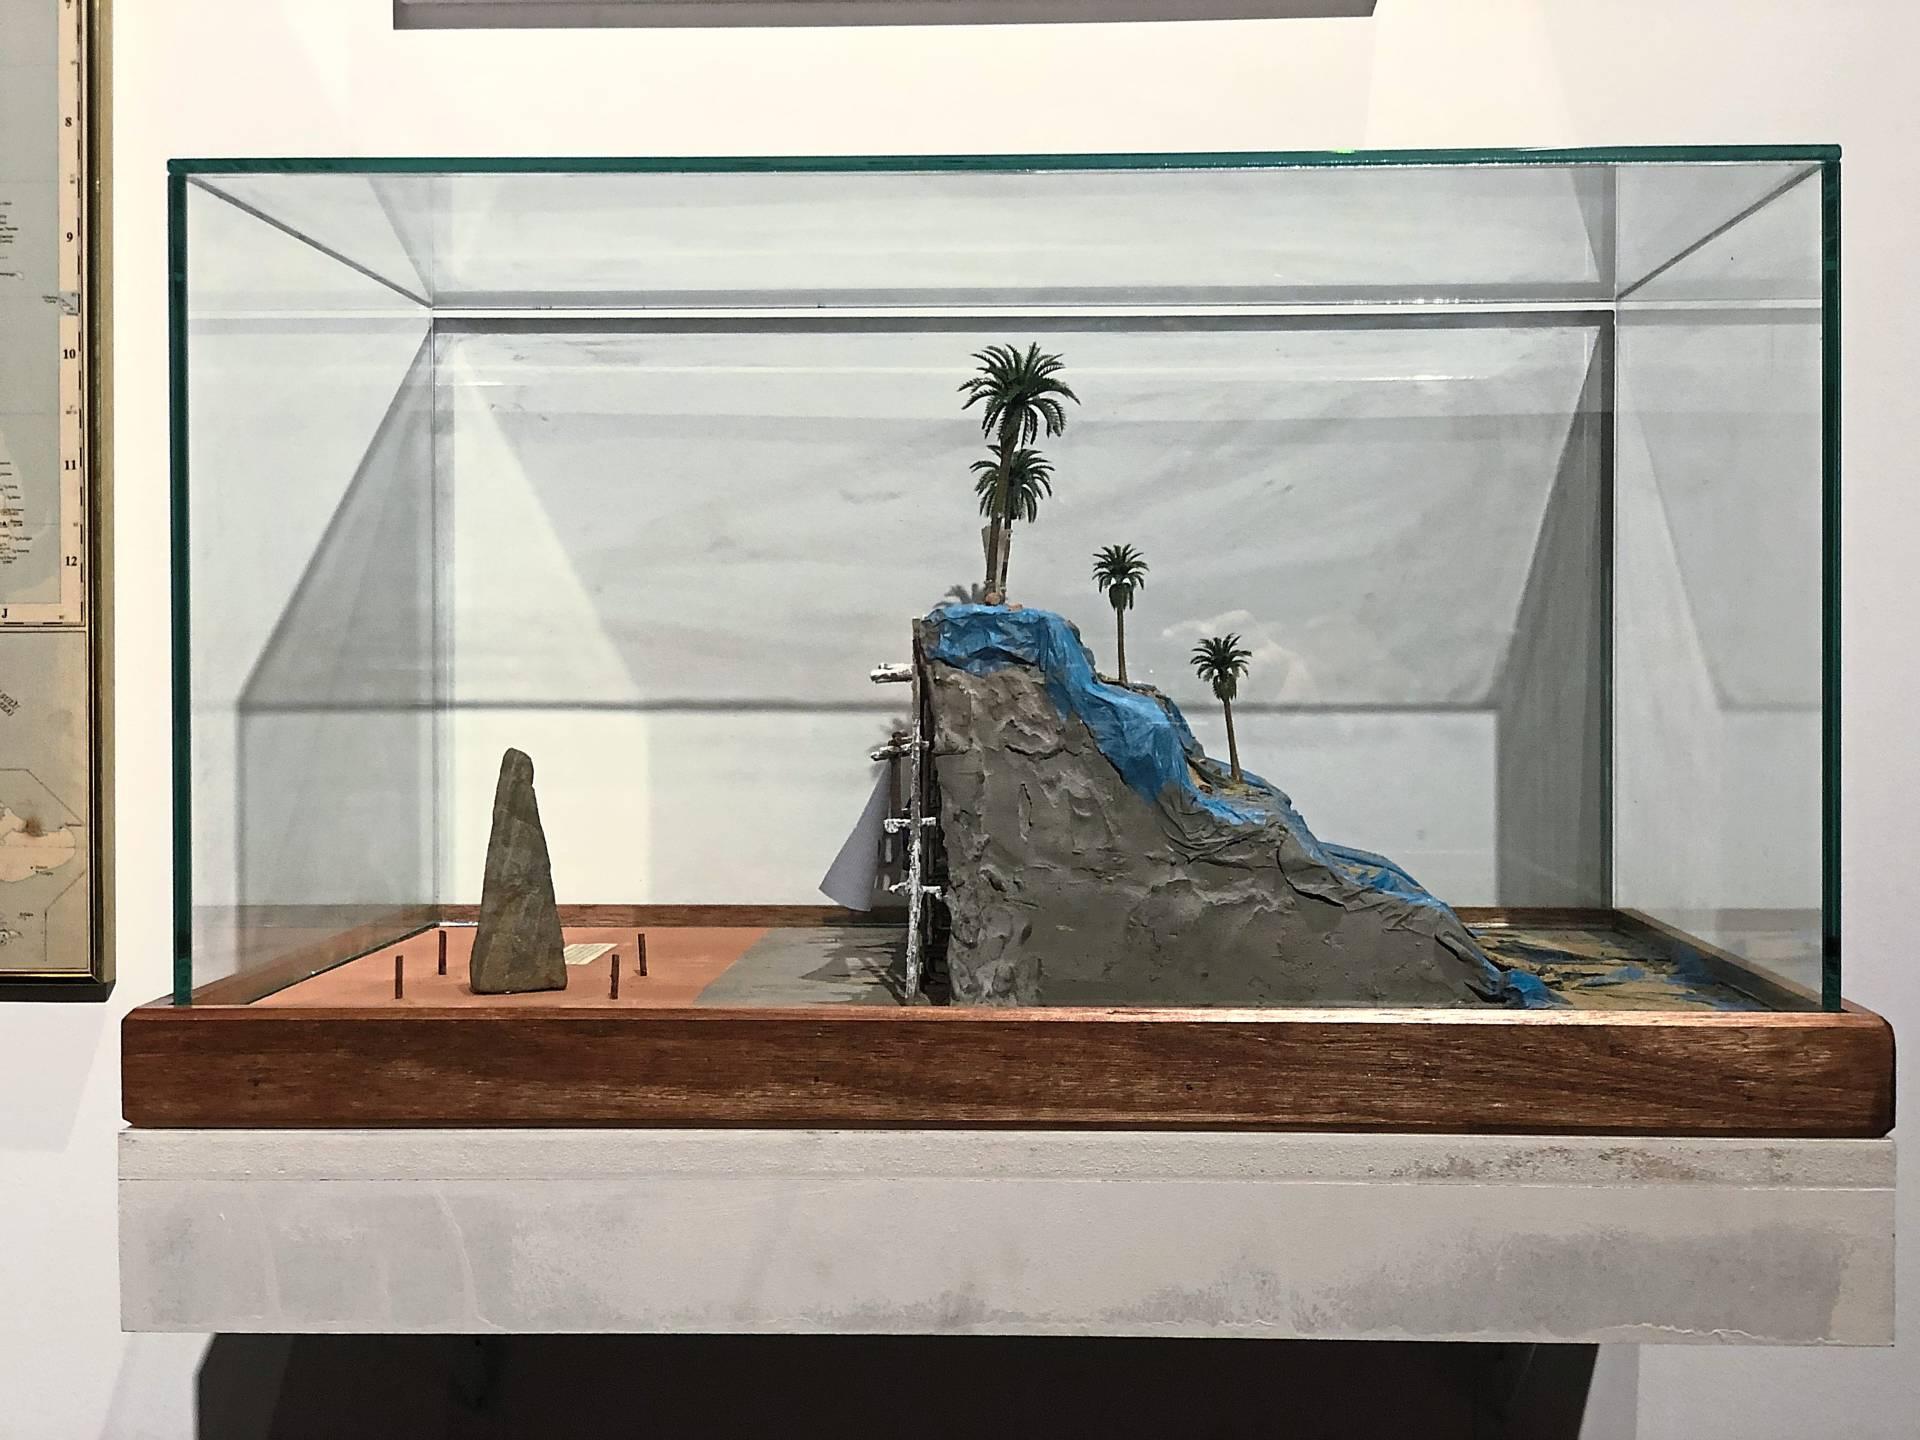 Izat Arif's 'Taman Kenangan 23' (cement, soil, plaster, plastic coconut tree, tarpaulin, stone, wood and glass, 2019). Photo: Ilham Gallery